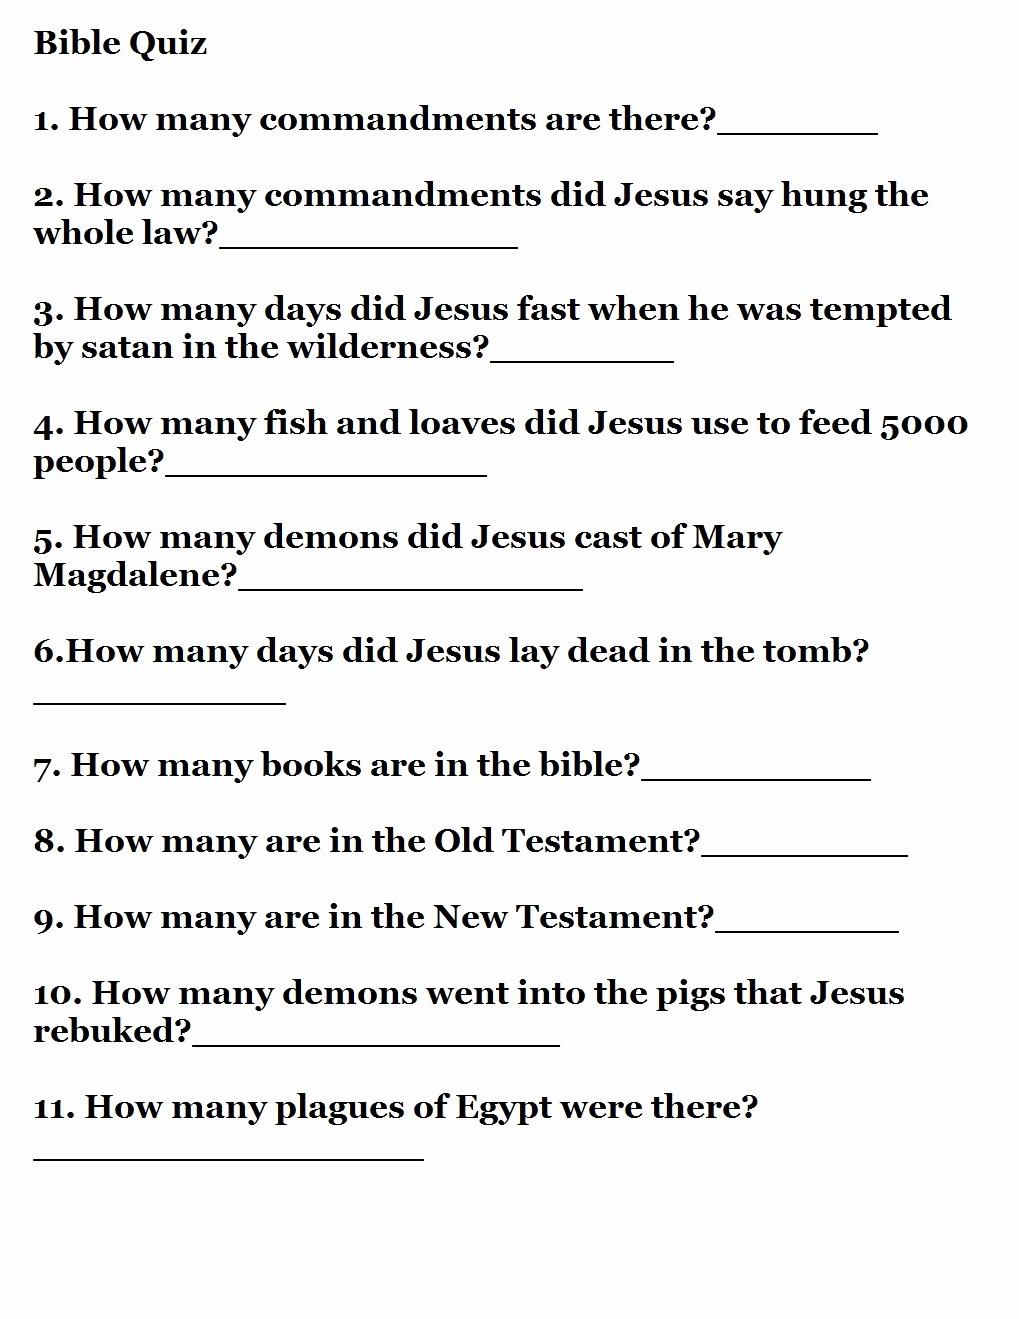 Printable Bible Trivia And 15 Easy Bible Trivia Questions – Rtrs.online - Free Printable Bible Trivia For Adults